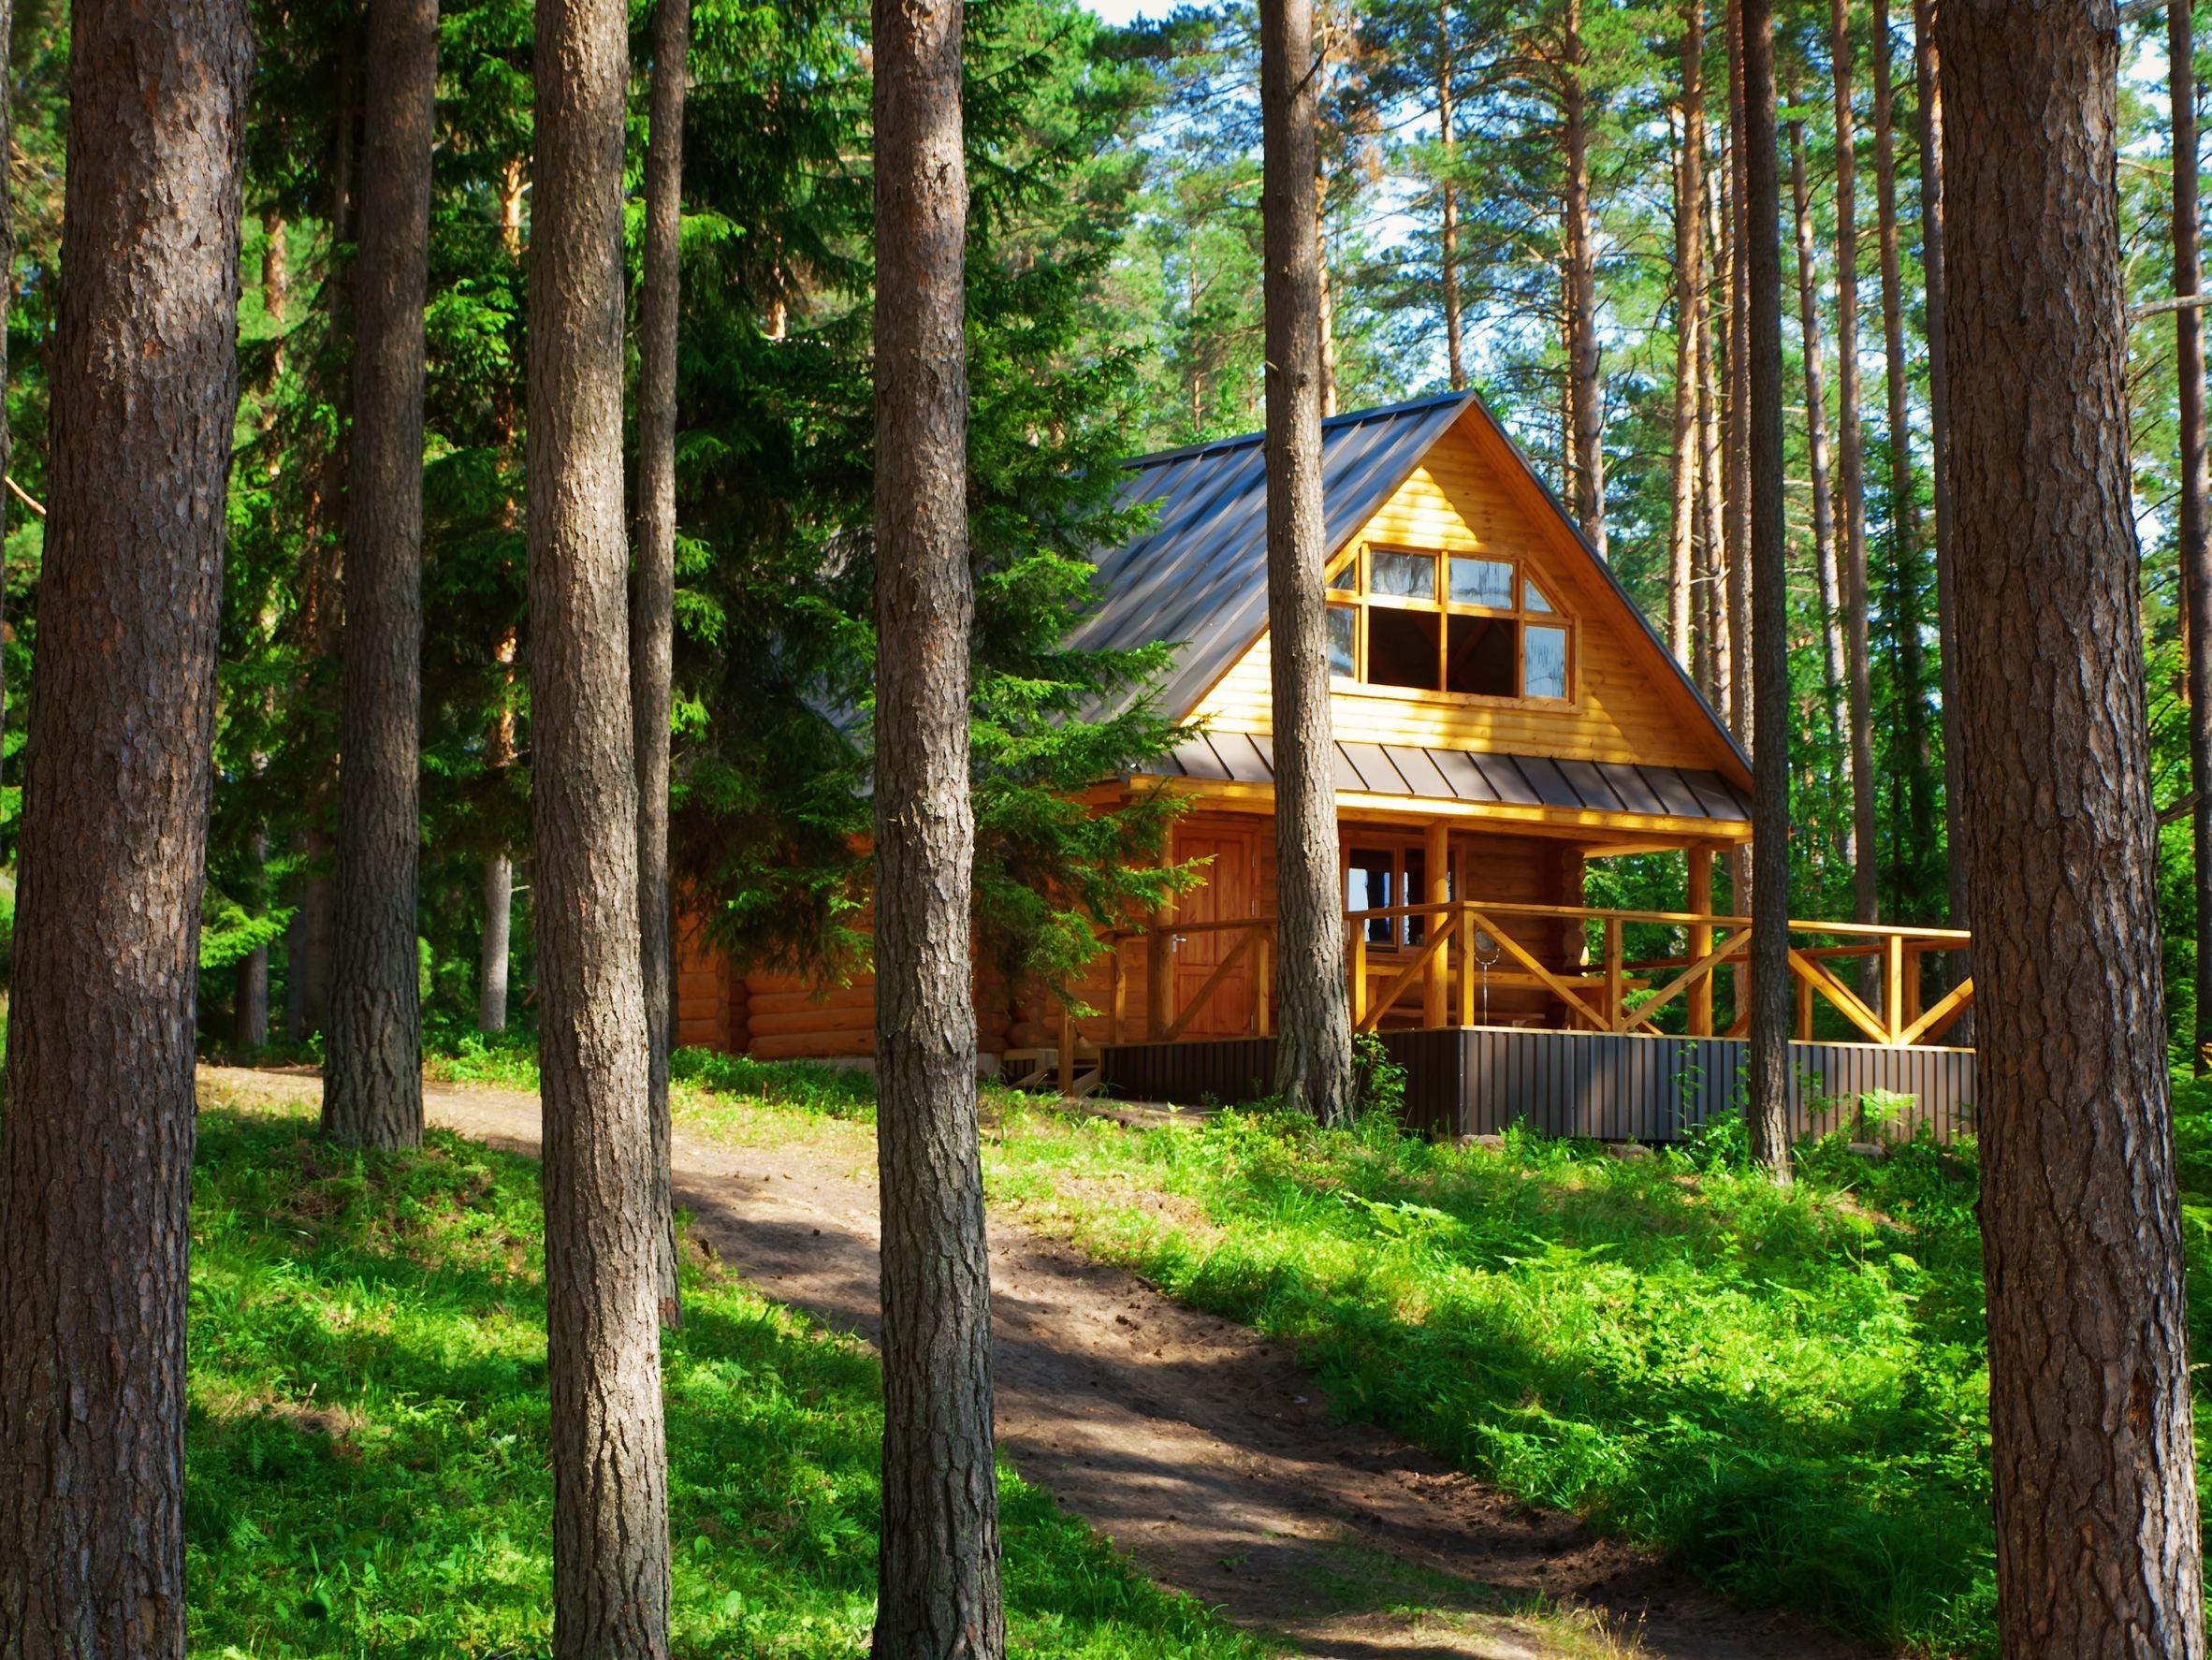 Doyle Log Home Restoration - Restoring, Repairing, and